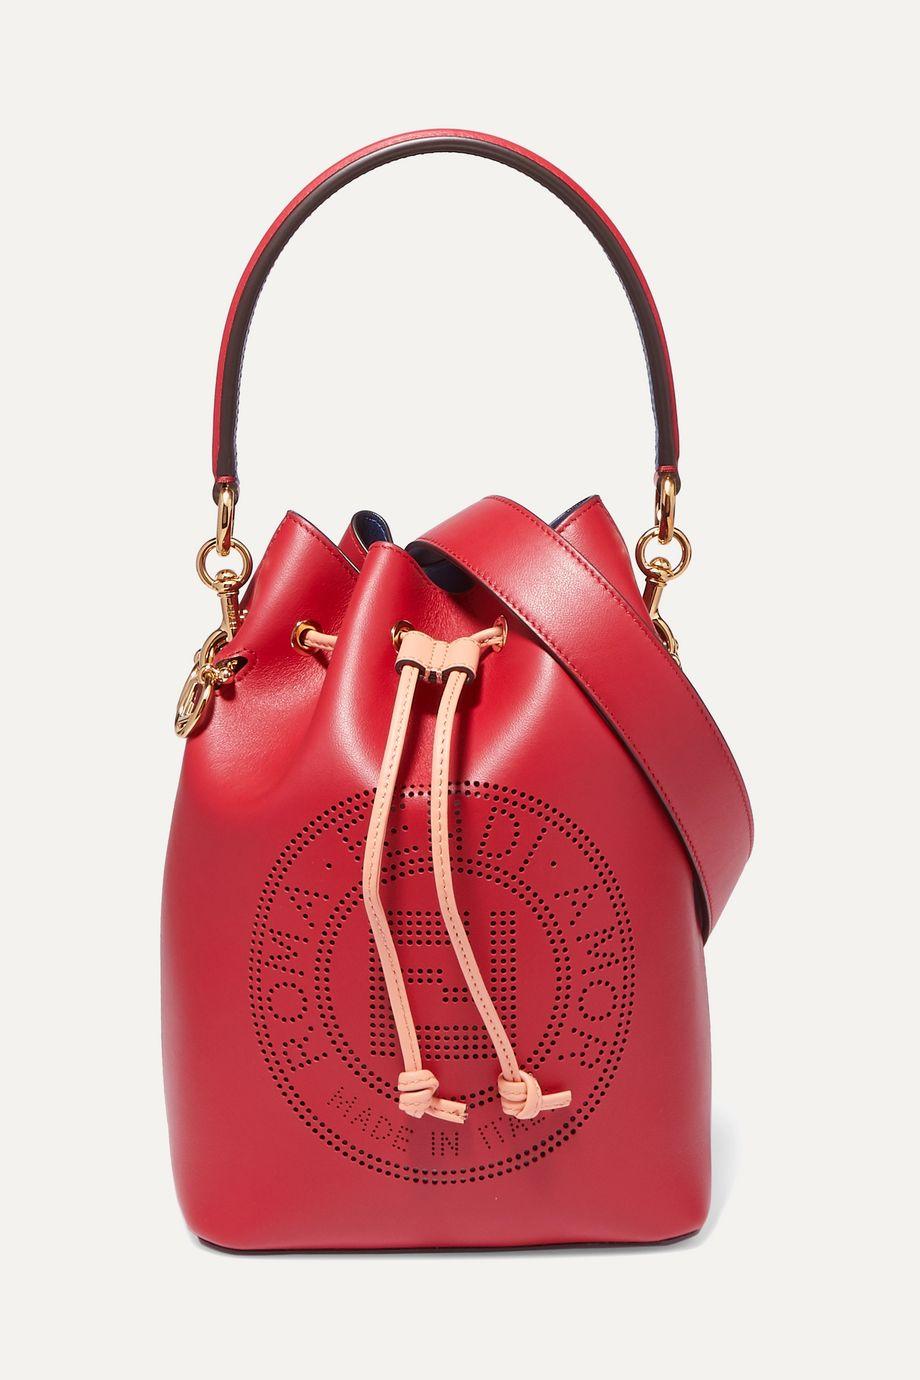 Fendi Mon Trésor perforated leather bucket bag